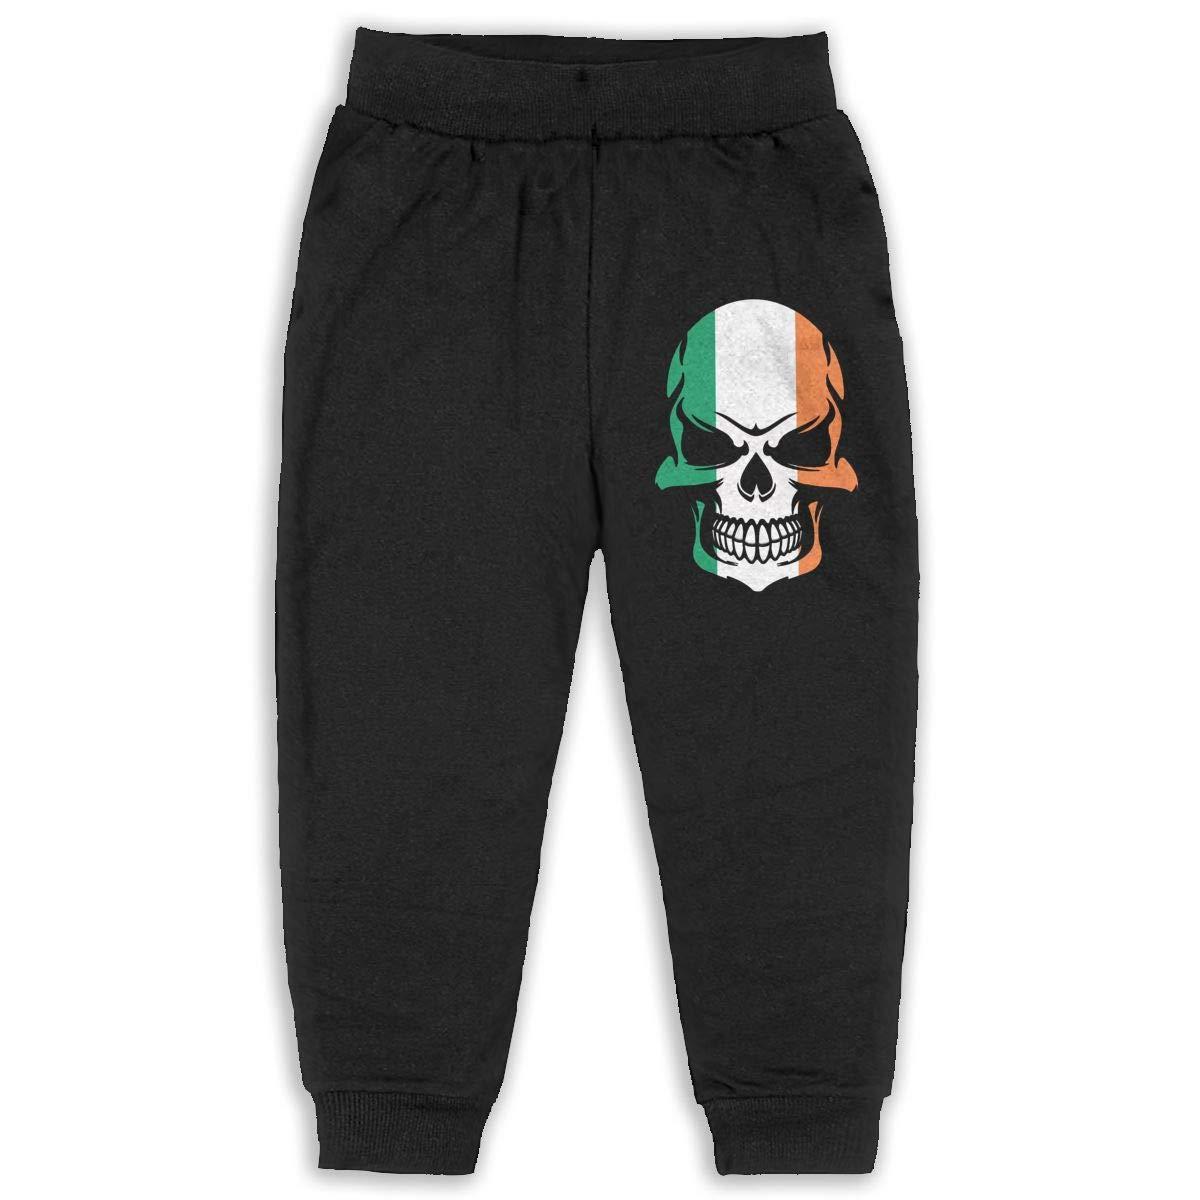 DaXi1 Skull Sweatpants for Boys /& Girls Fleece Active Joggers Elastic Pants